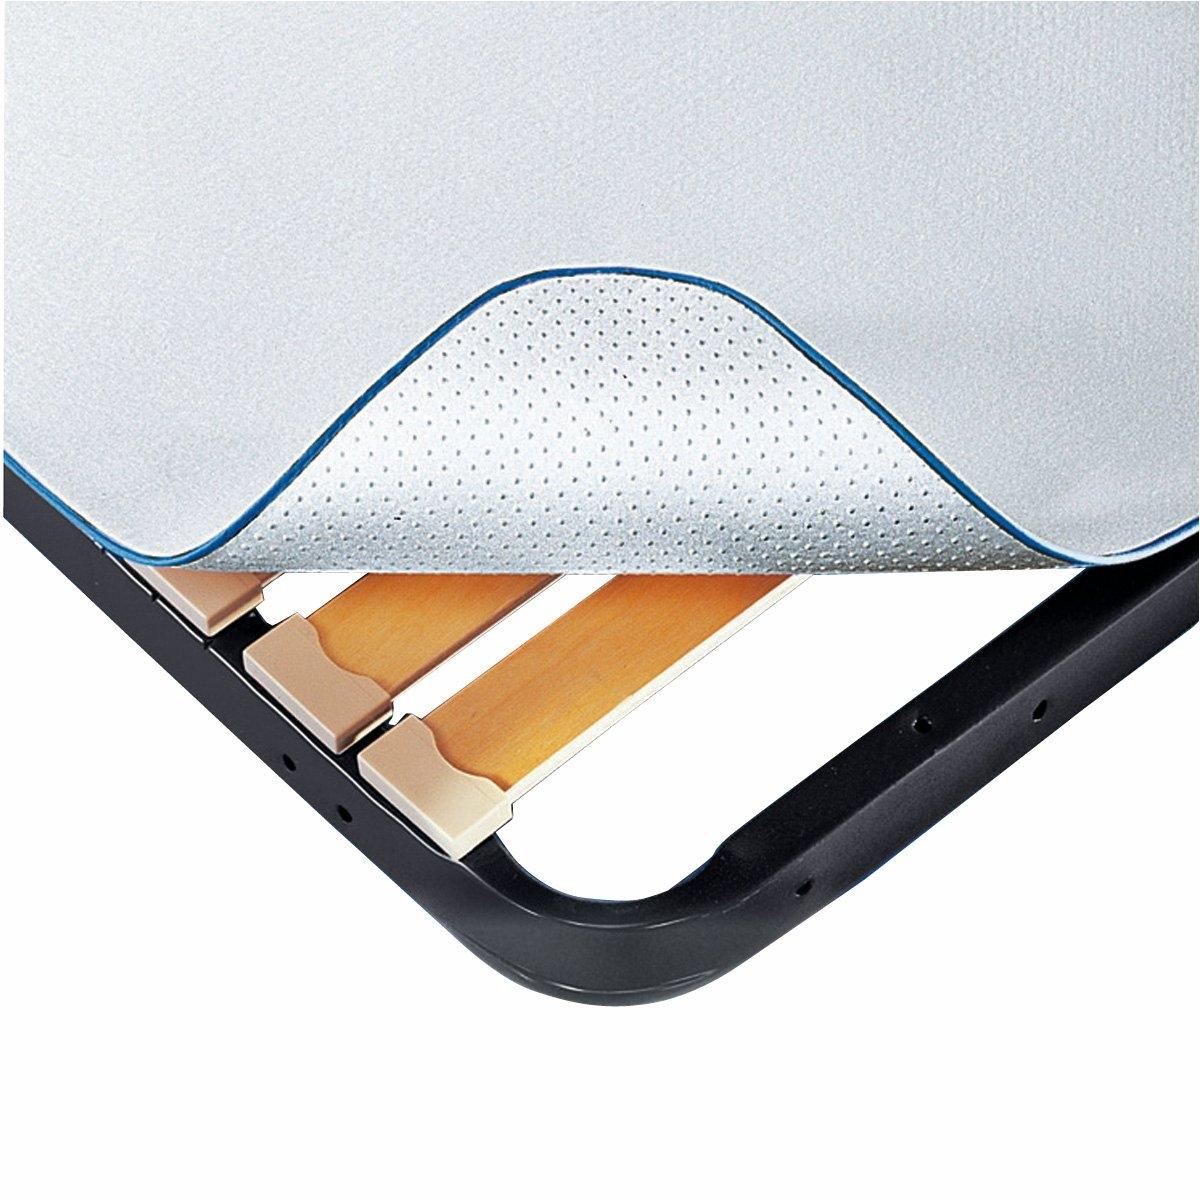 цена на Защитная La Redoute Подкладка под матрас 80 x 200 см белый